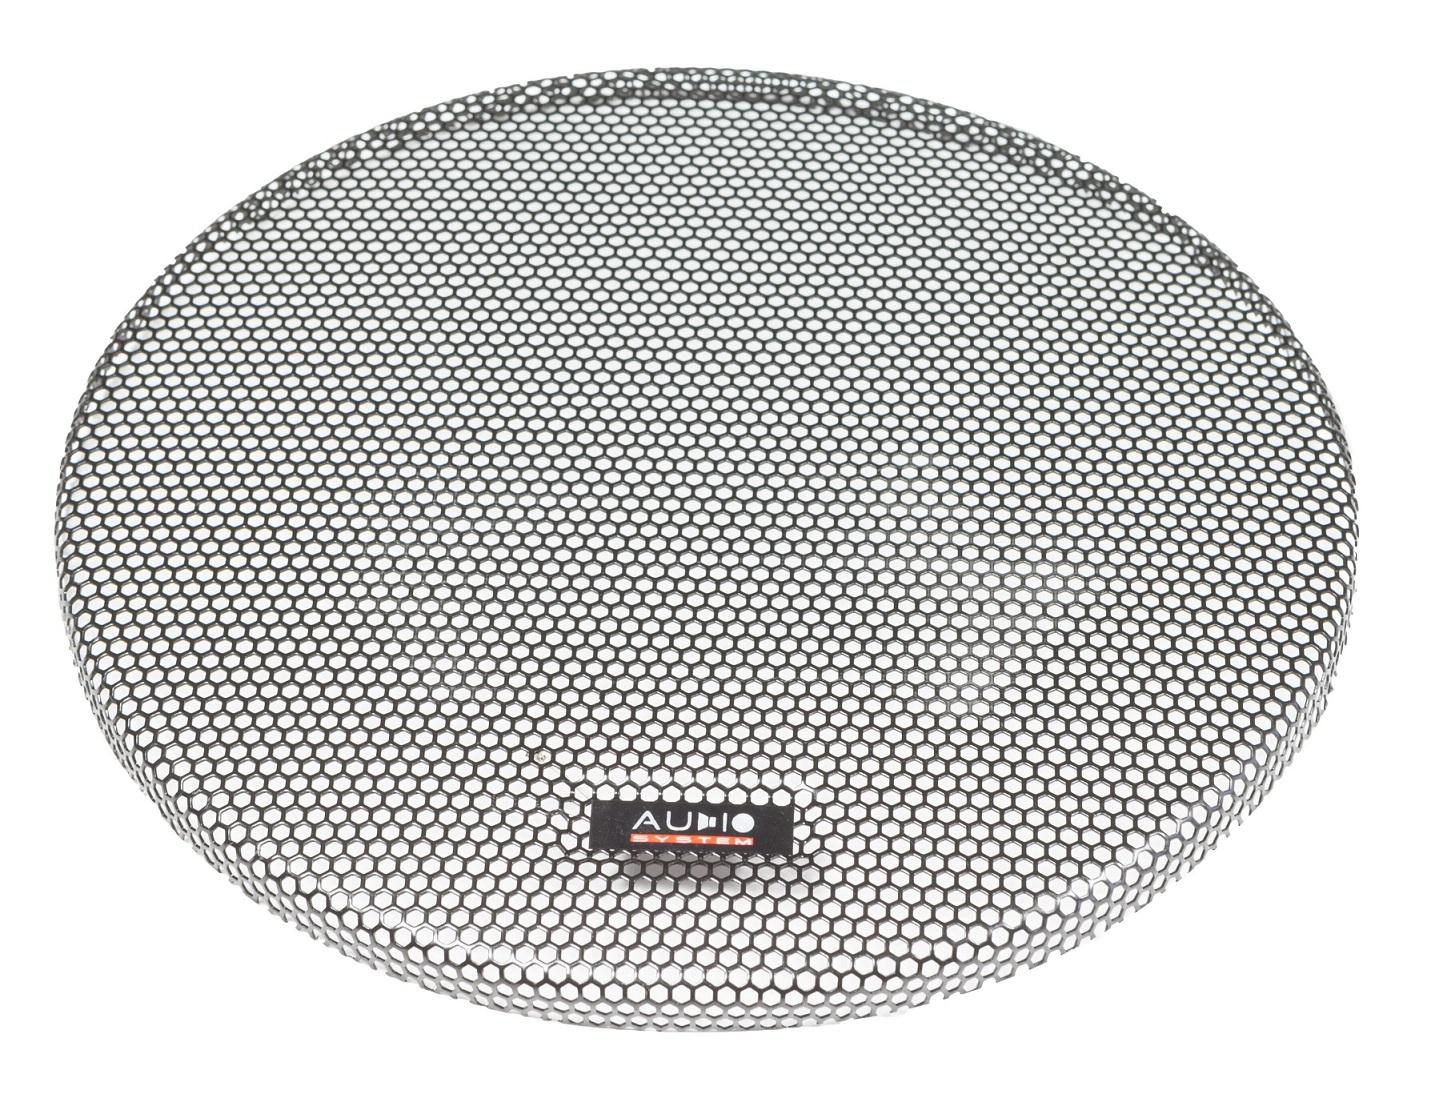 Audio System GI AX08 BMW 200mm Lautsprechergitter für AX08 BMW EVO2, AX08 BMW EVO, AX08 BMW MK2 und AX08 BMW